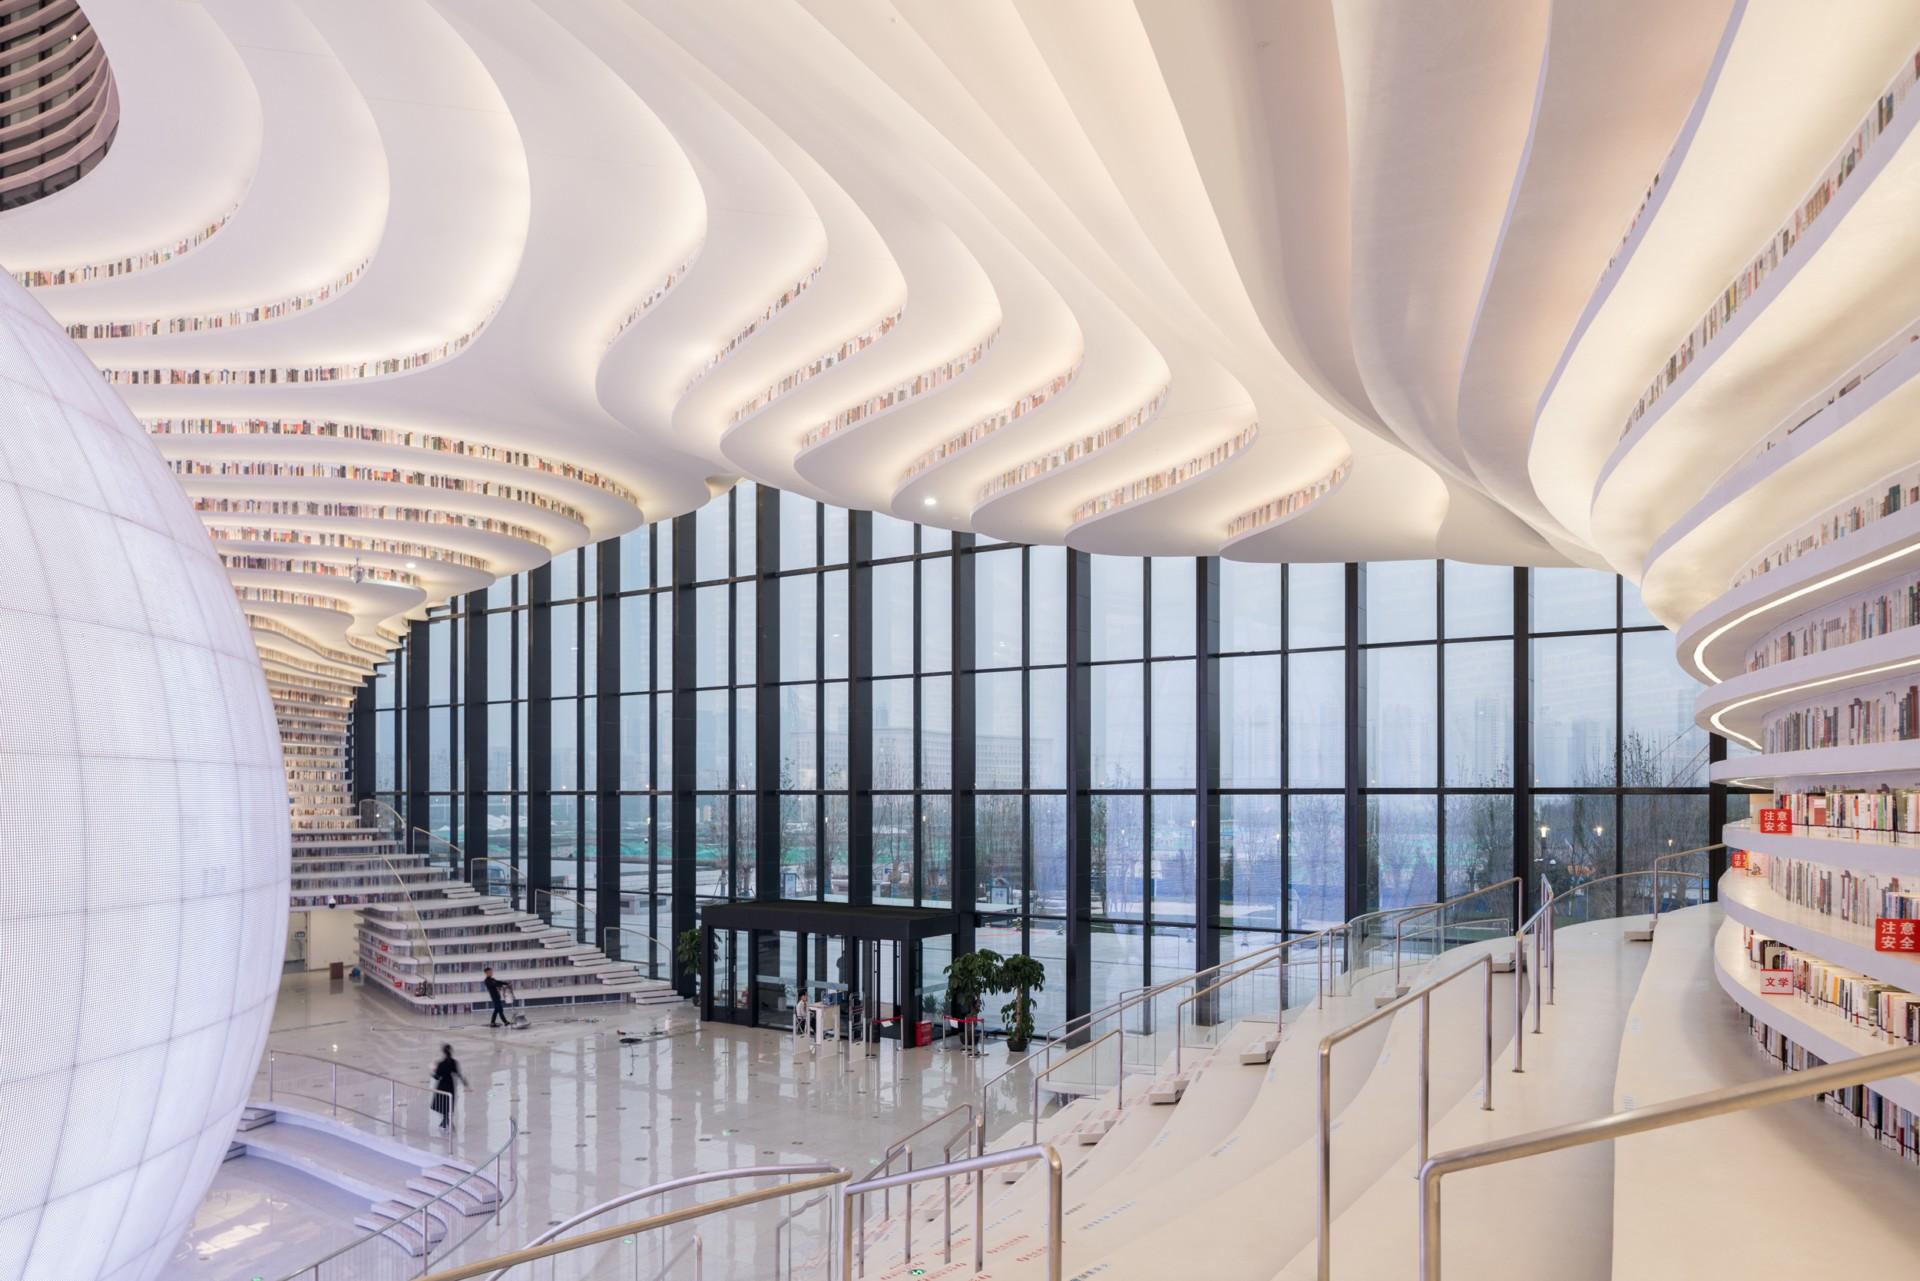 MVRDV Tianjin Binhai Library un oceano di libri